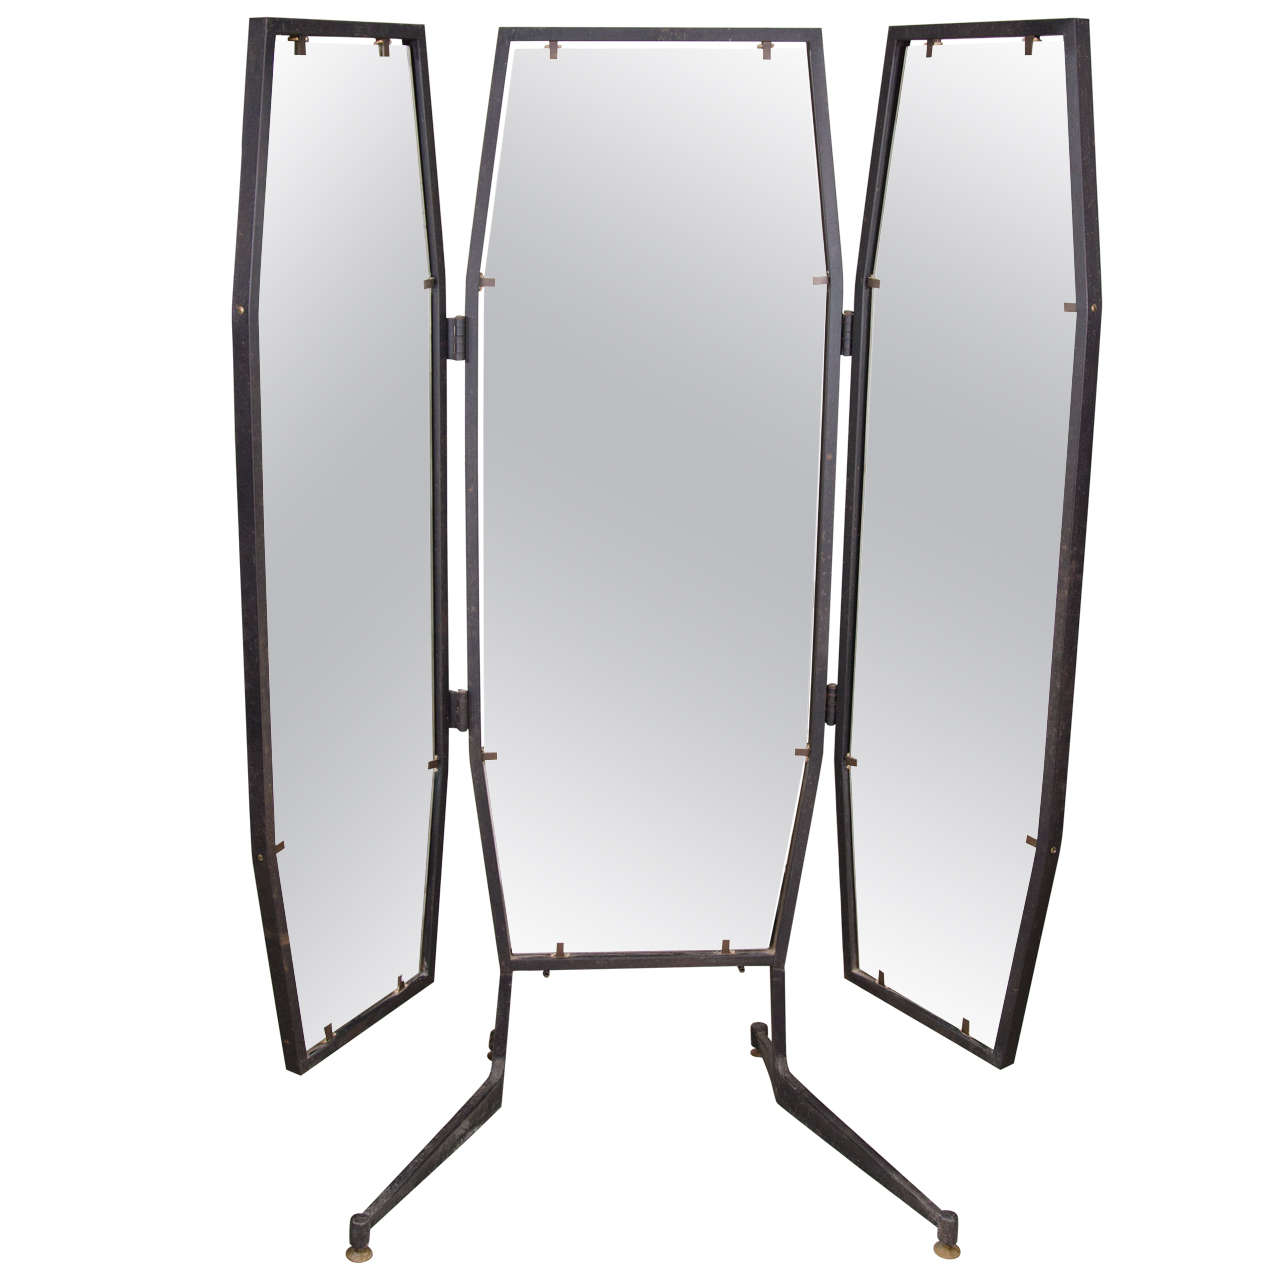 Italian Full Length Adjustable Three-Way Mirror For Sale at 1stdibs